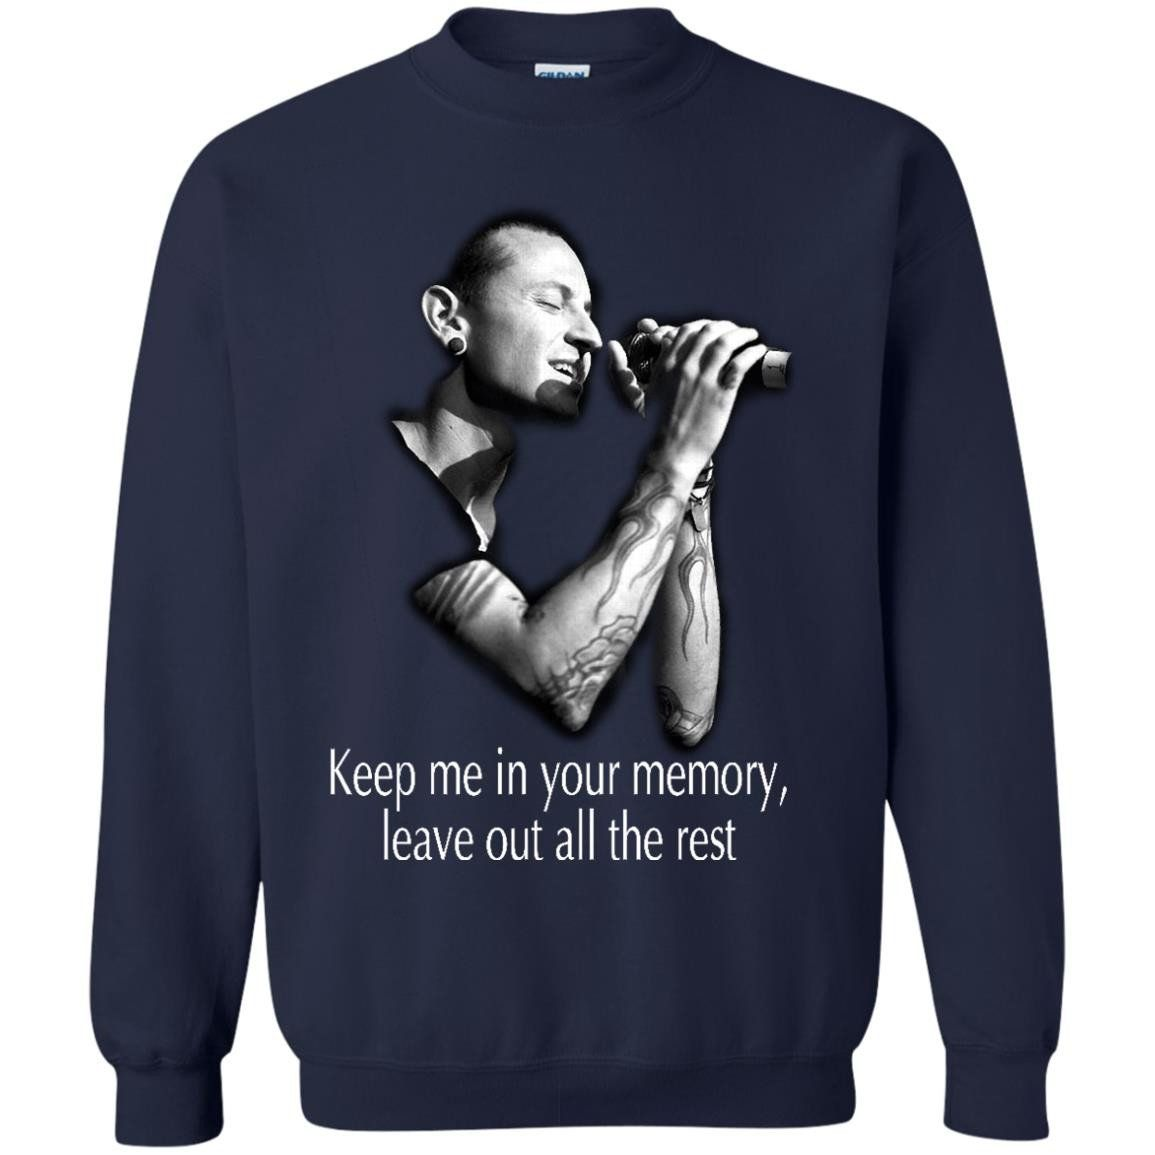 Linkin Park Rock Band Chester Bennington Zip Hoodie Sweatshirt